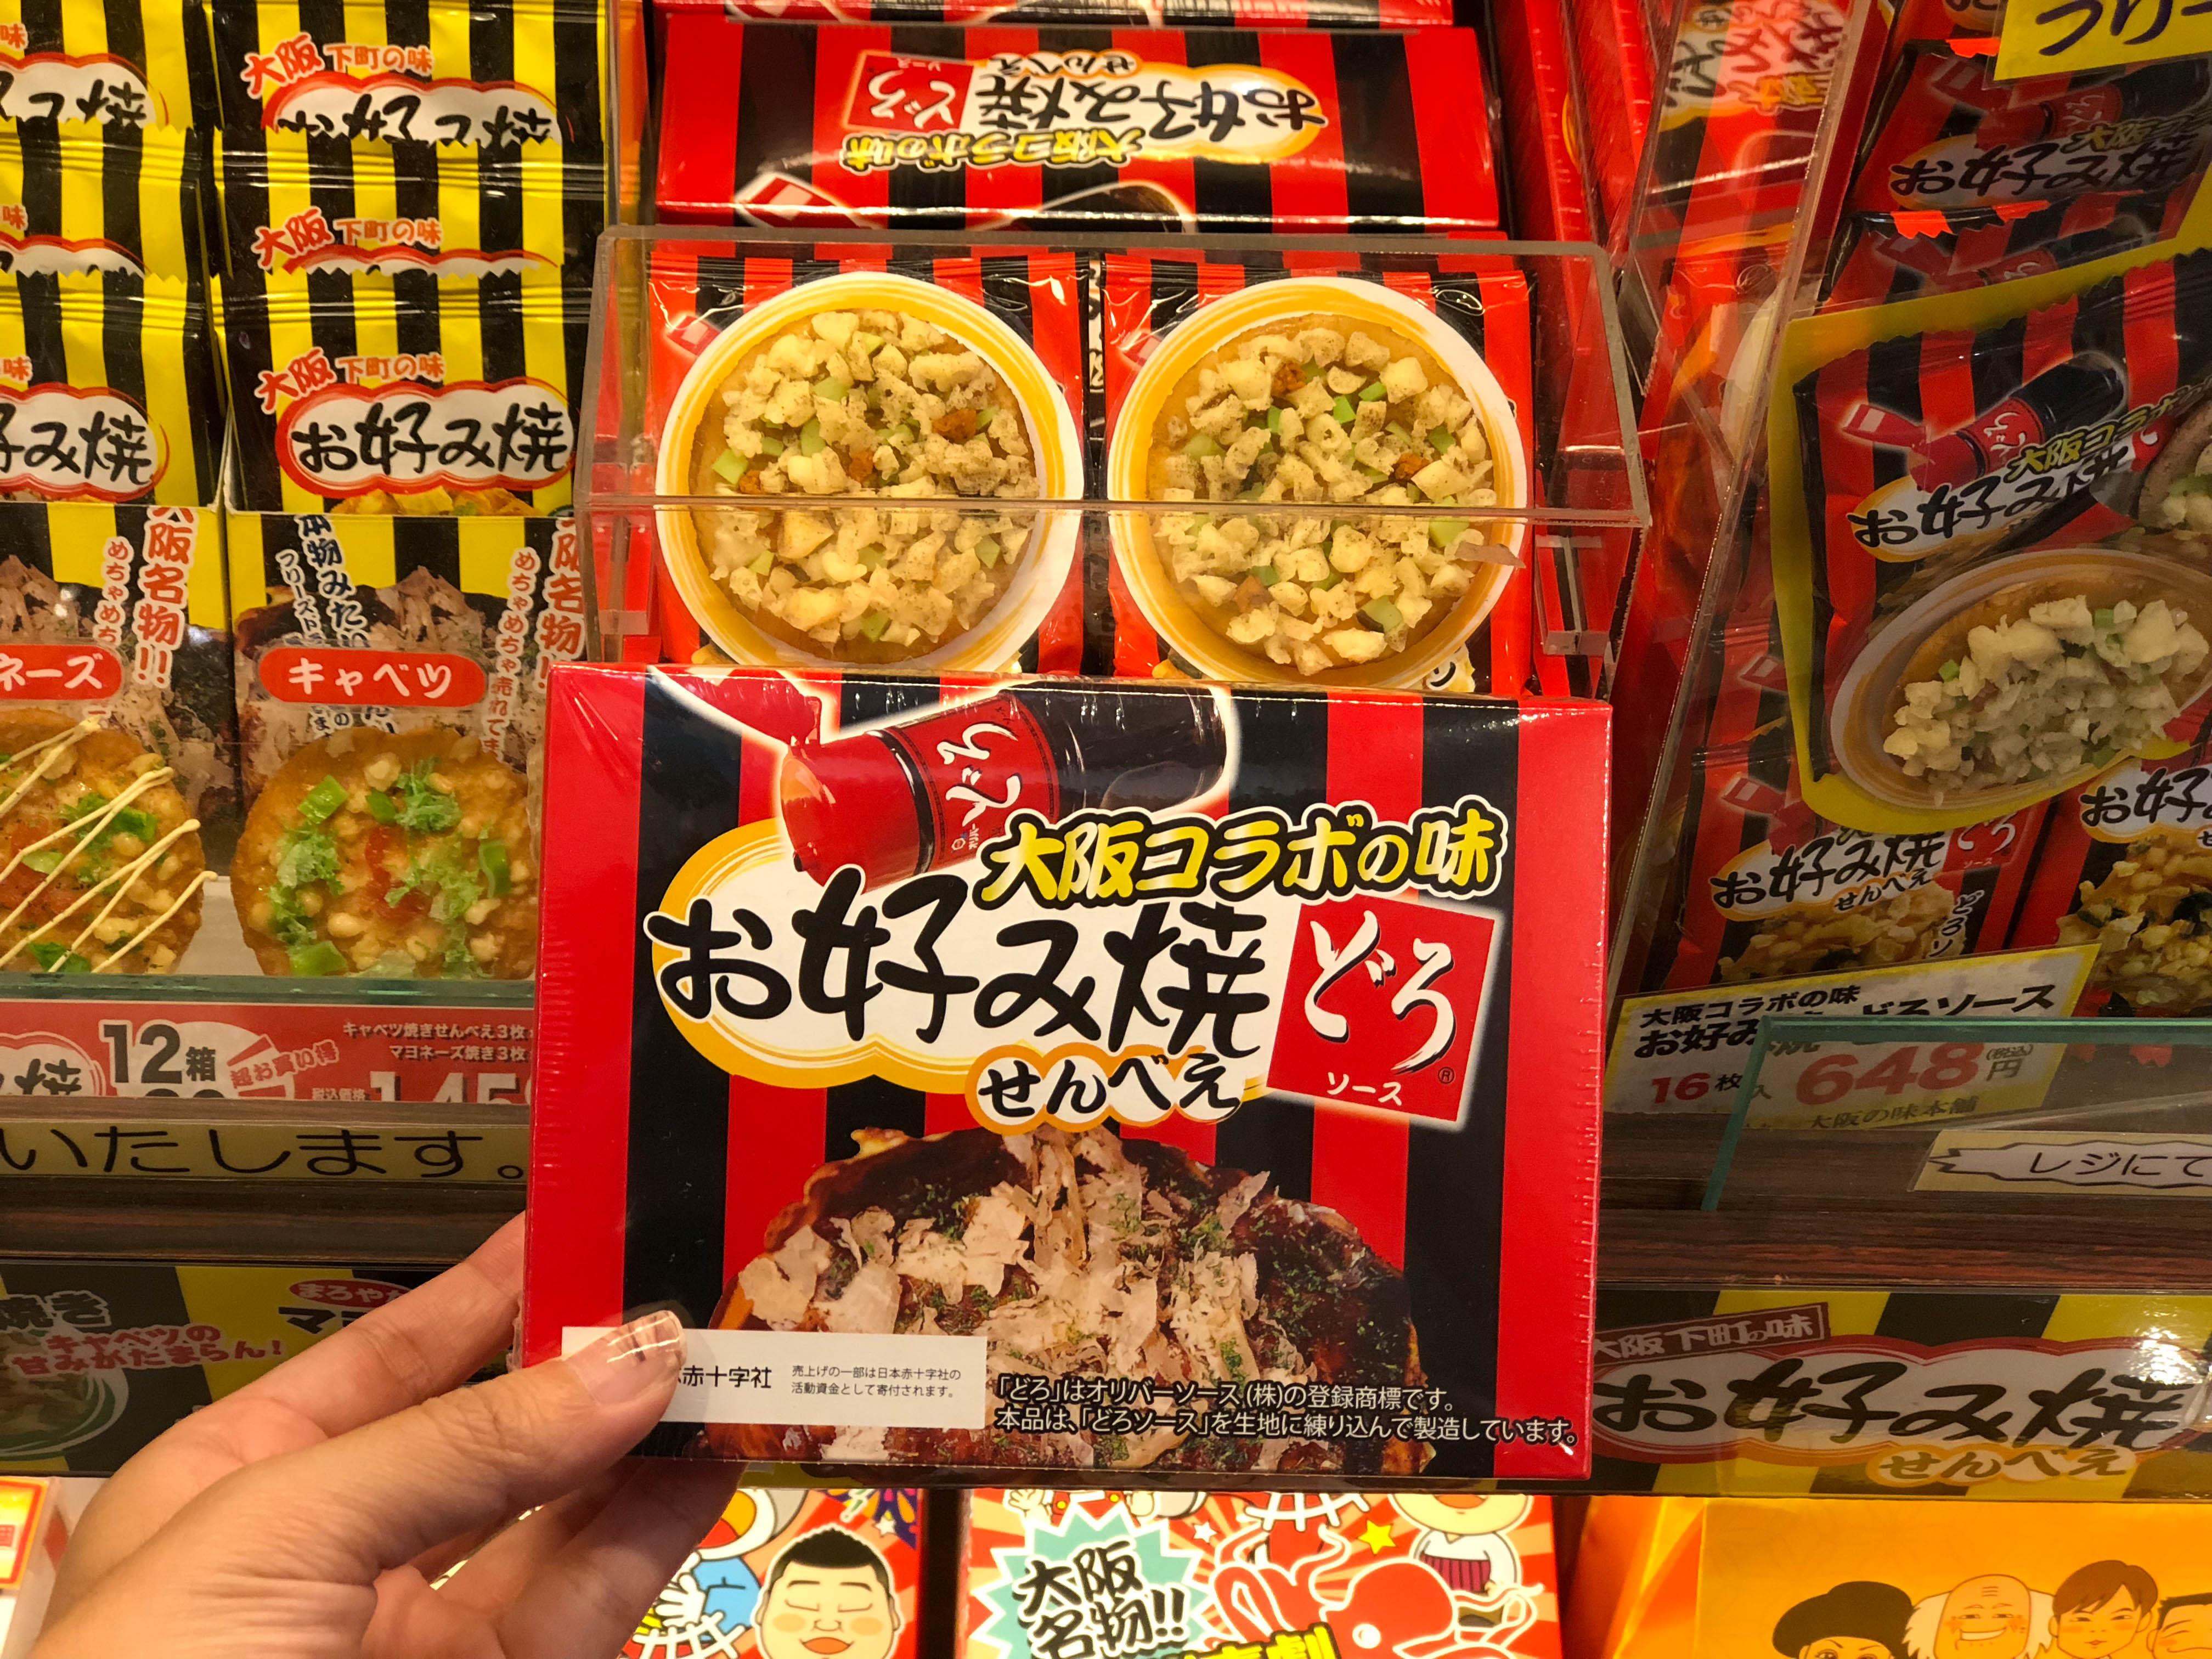 Osaka - Klook Japan Guide